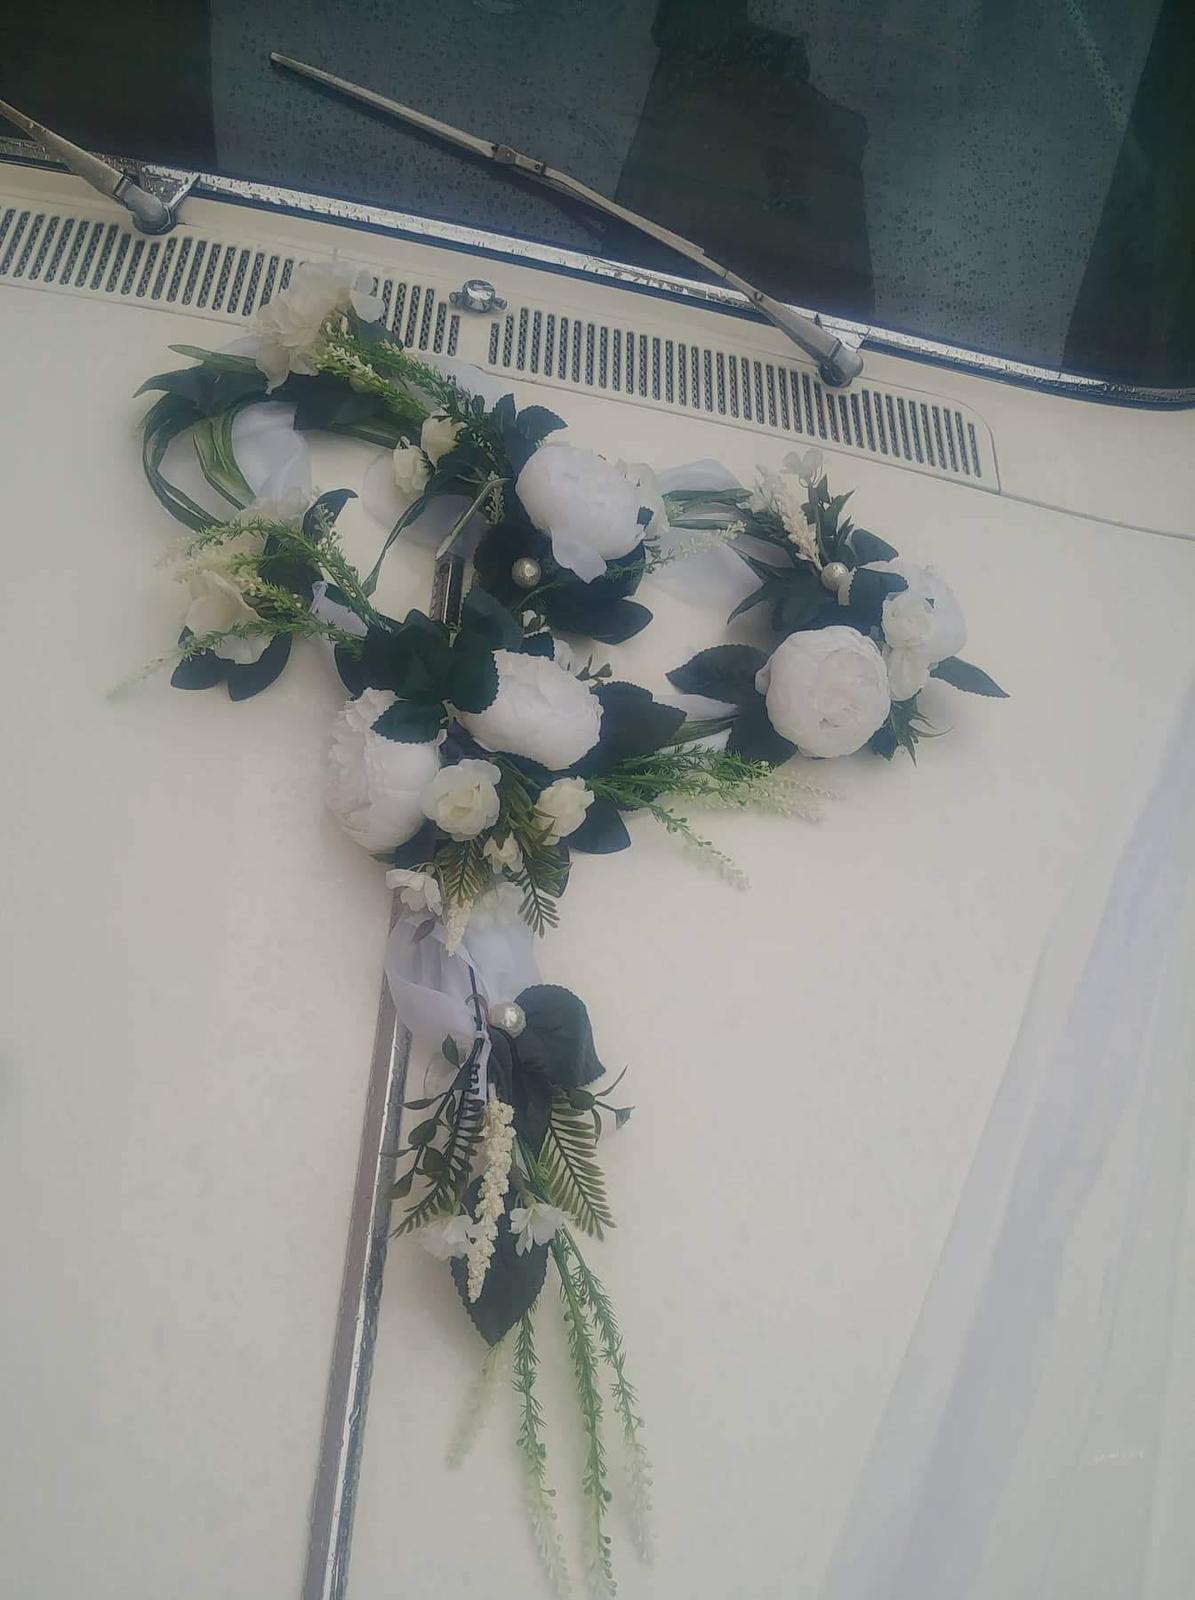 Rolls Royce svadba v Nitre - Obrázok č. 6